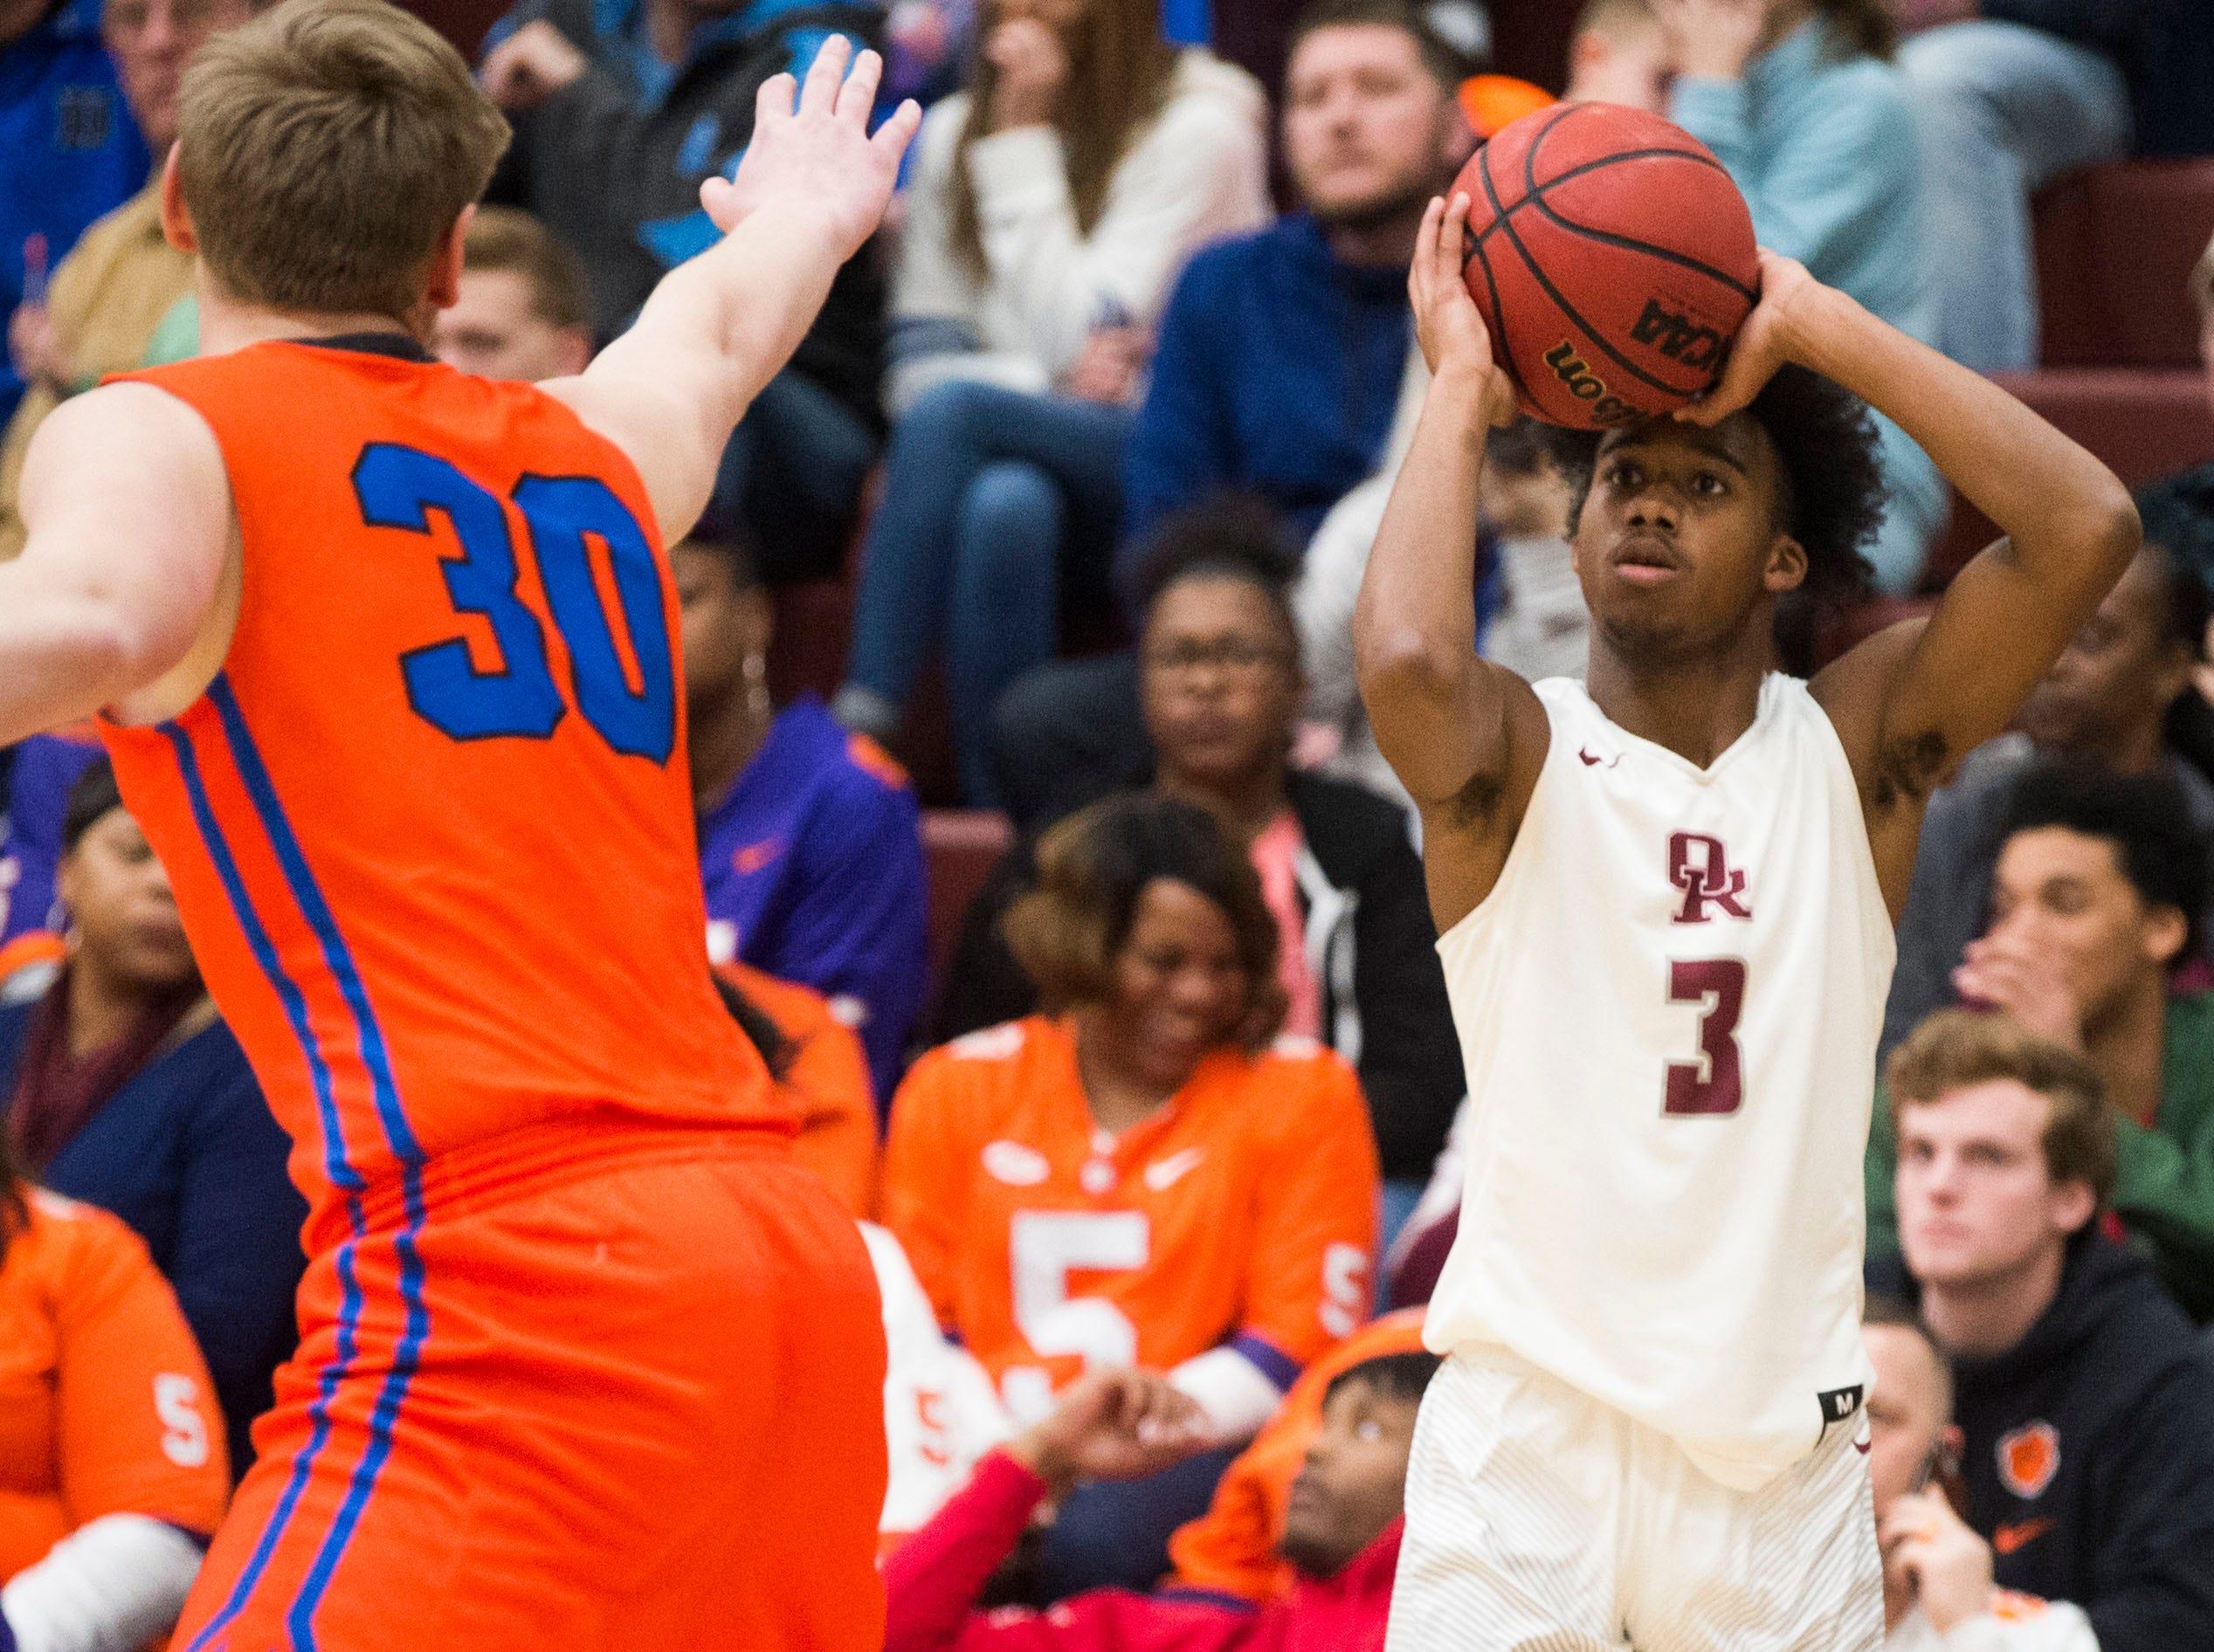 Oak Ridge's JaVonte Thomas (3) takes a shot during a high school basketball game between Oak Ridge and Campbell County at Oak Ridge Friday, Feb. 1, 2019.